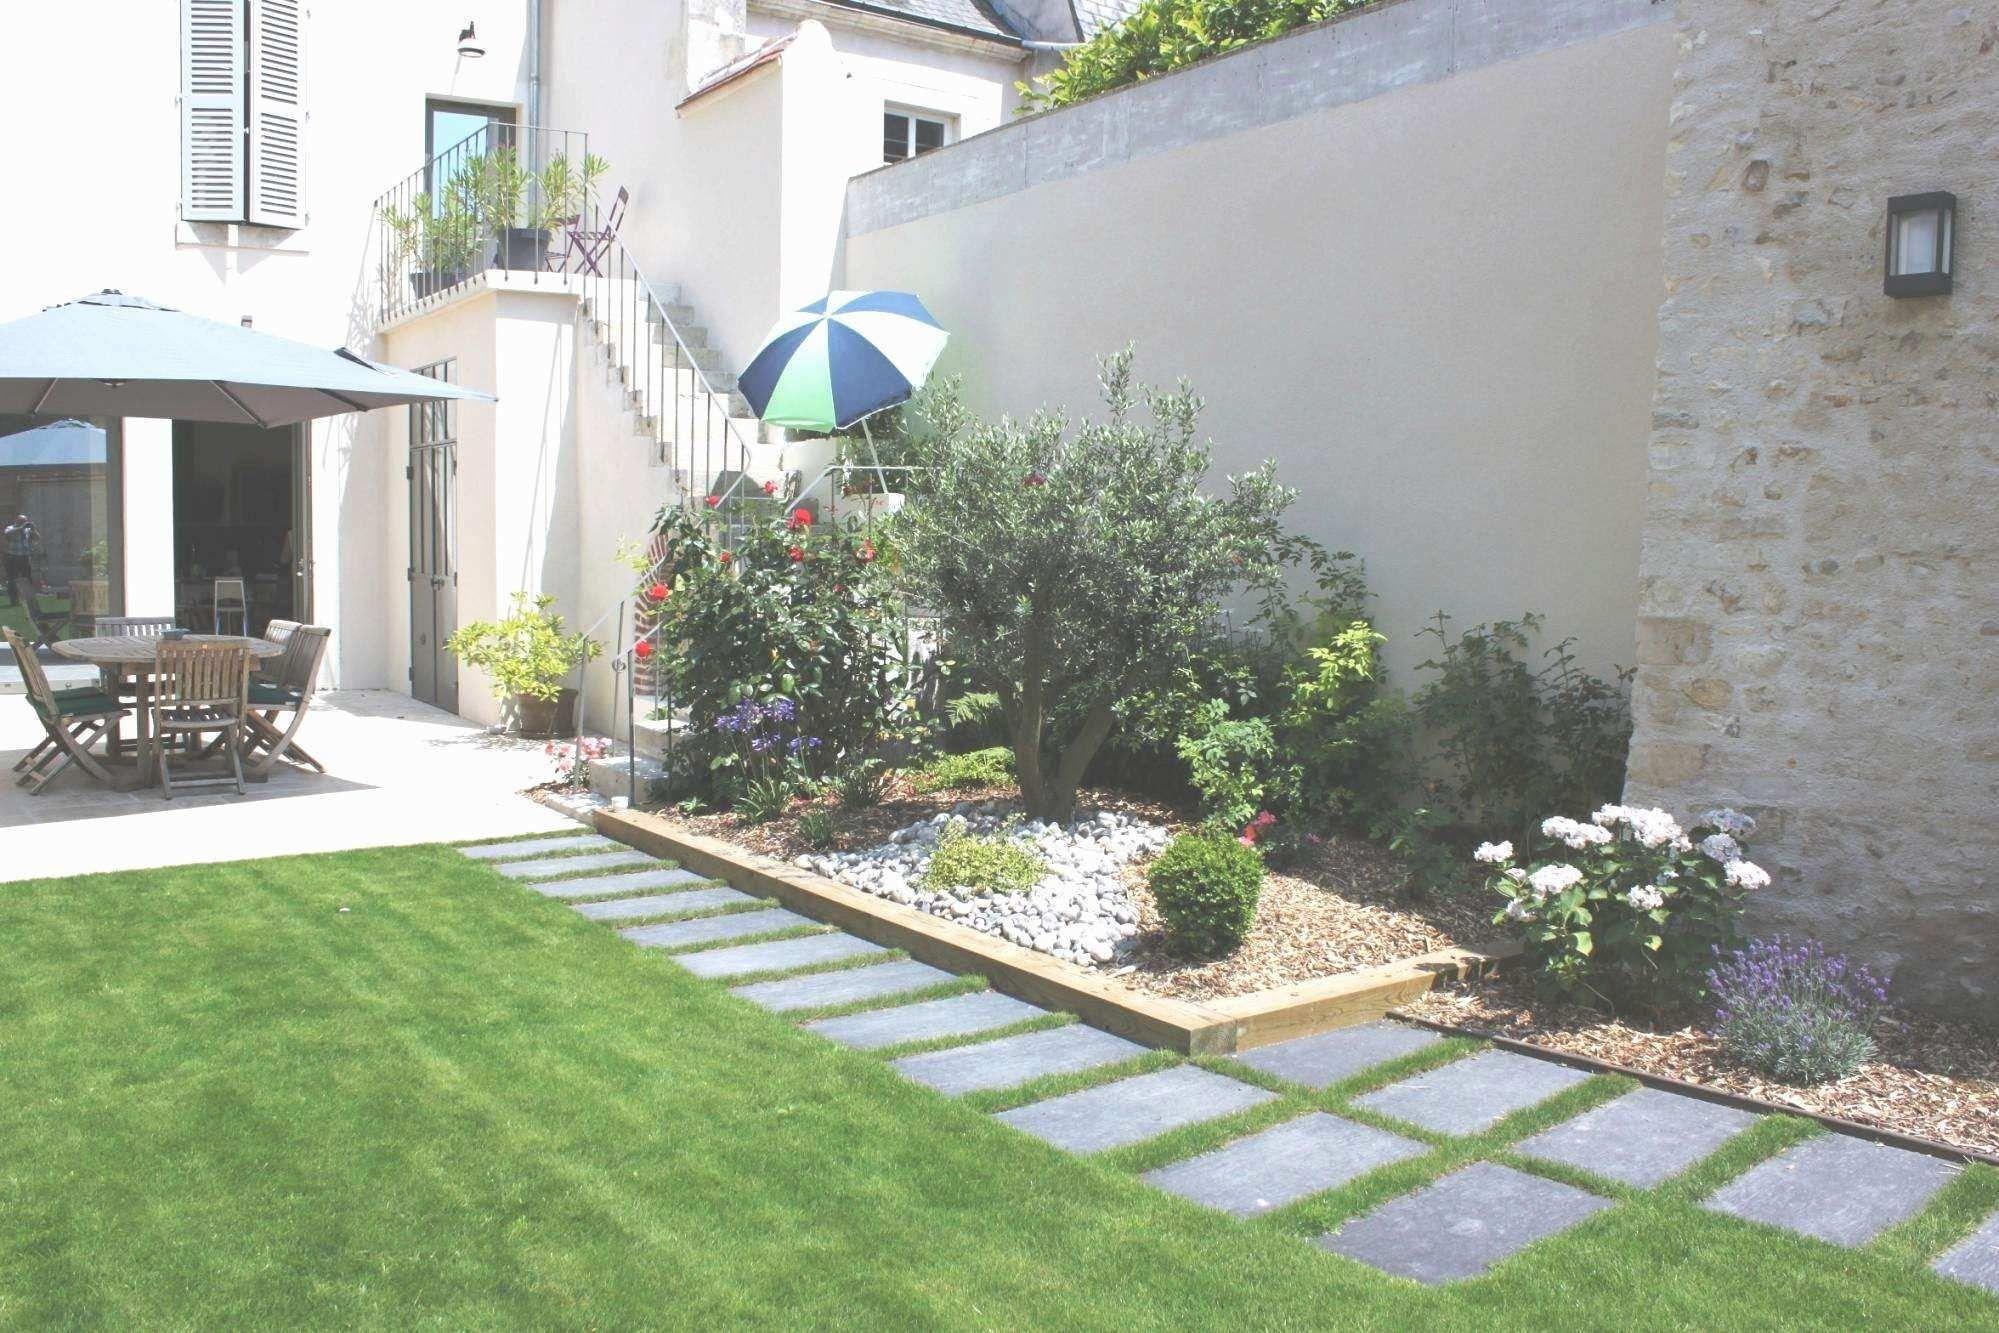 70 Amenager Un Petit Jardin De 100M2 Check More At Https ... dedans Amanager Un Petit Jardin